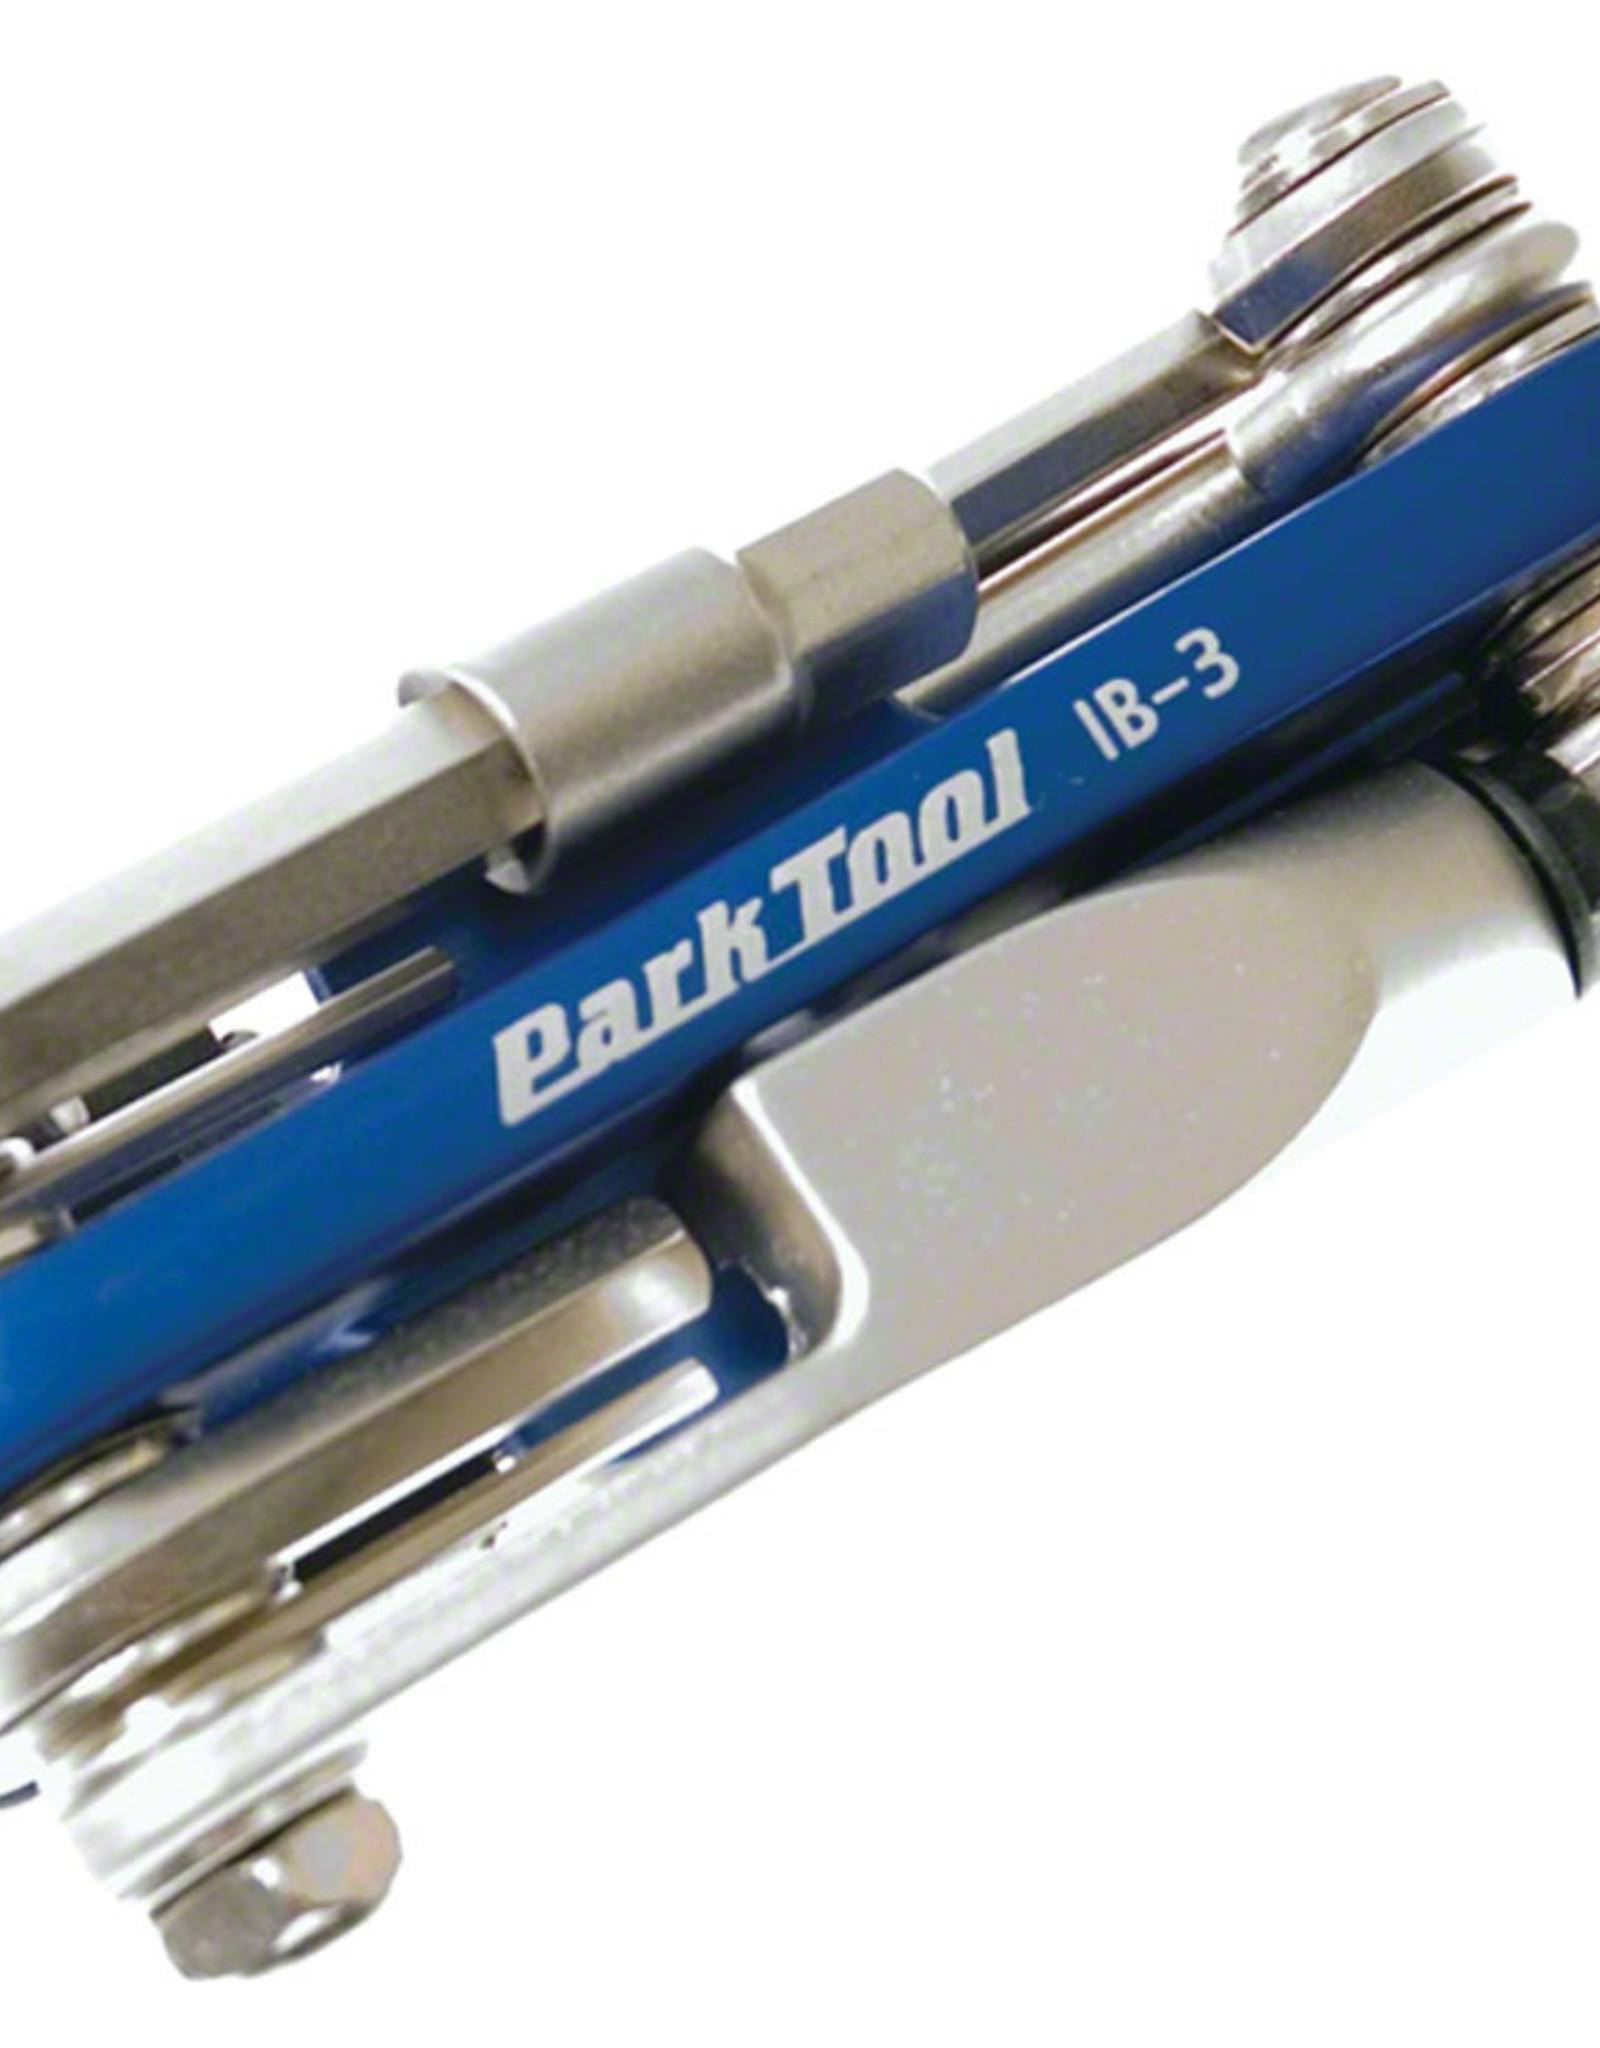 Park IB-3C I-Beam Mini Fold Up with Chain Tool